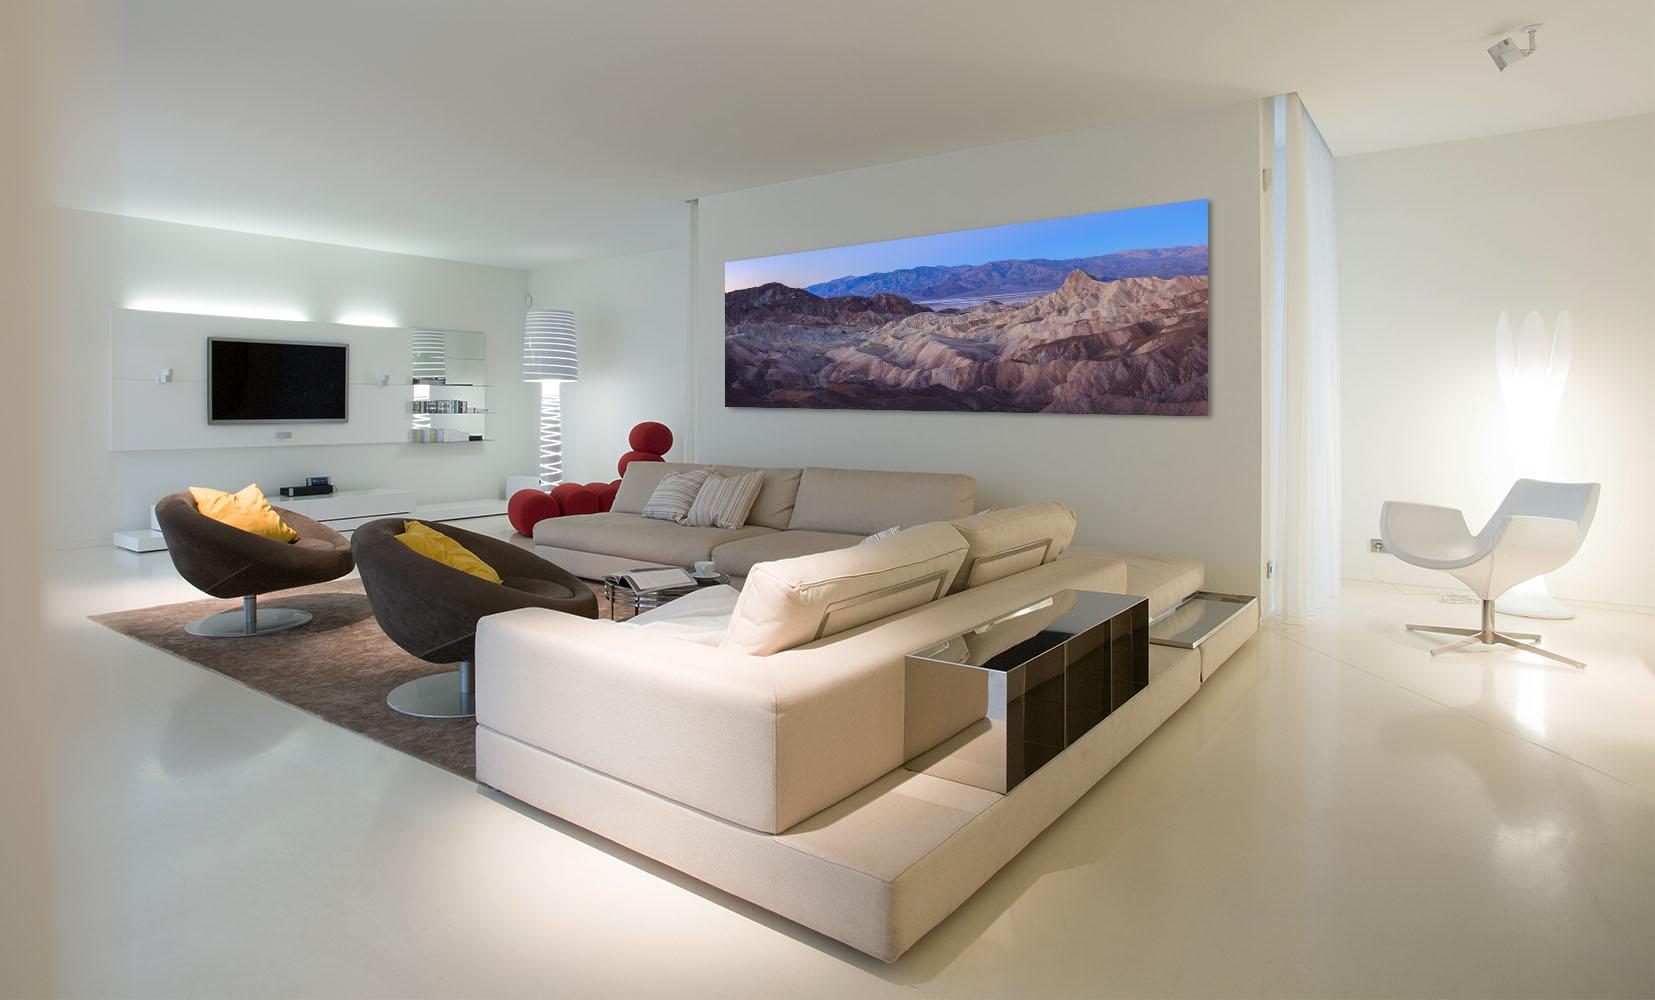 Death Valley Fine Art Luxury Home Decor Desert Mountains Artwork Michael Andrejkow